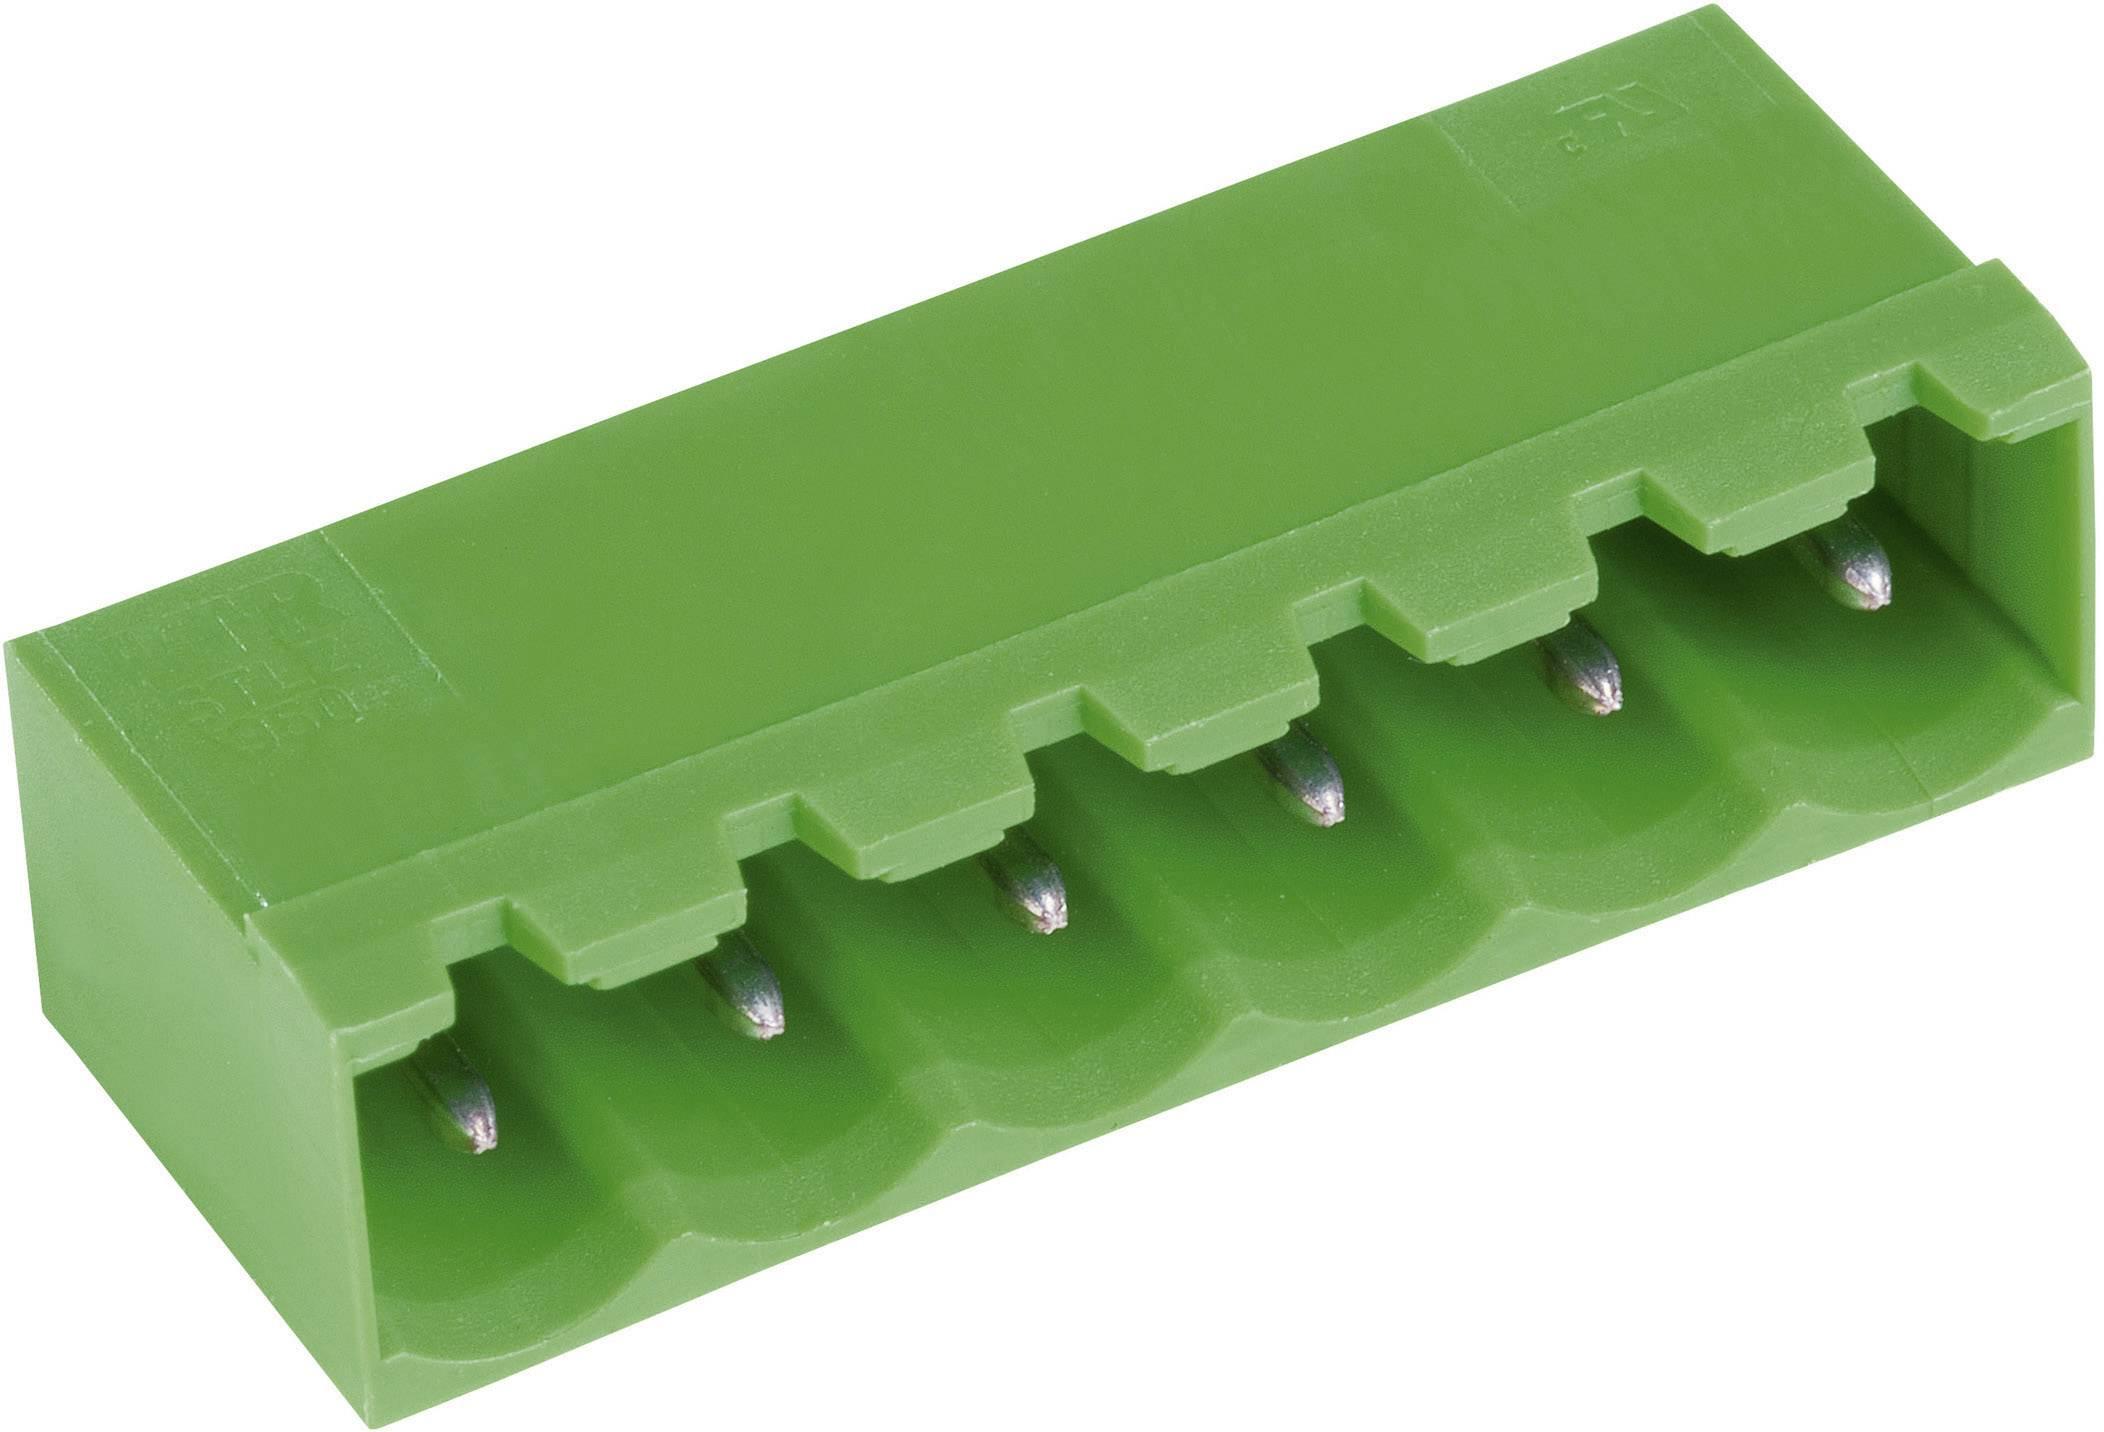 Konektor do DPS PTR STLZ950/5G-5.08-H 50950055021E, 26.60 mm, pólů 5, rozteč 5.08 mm, 1 ks